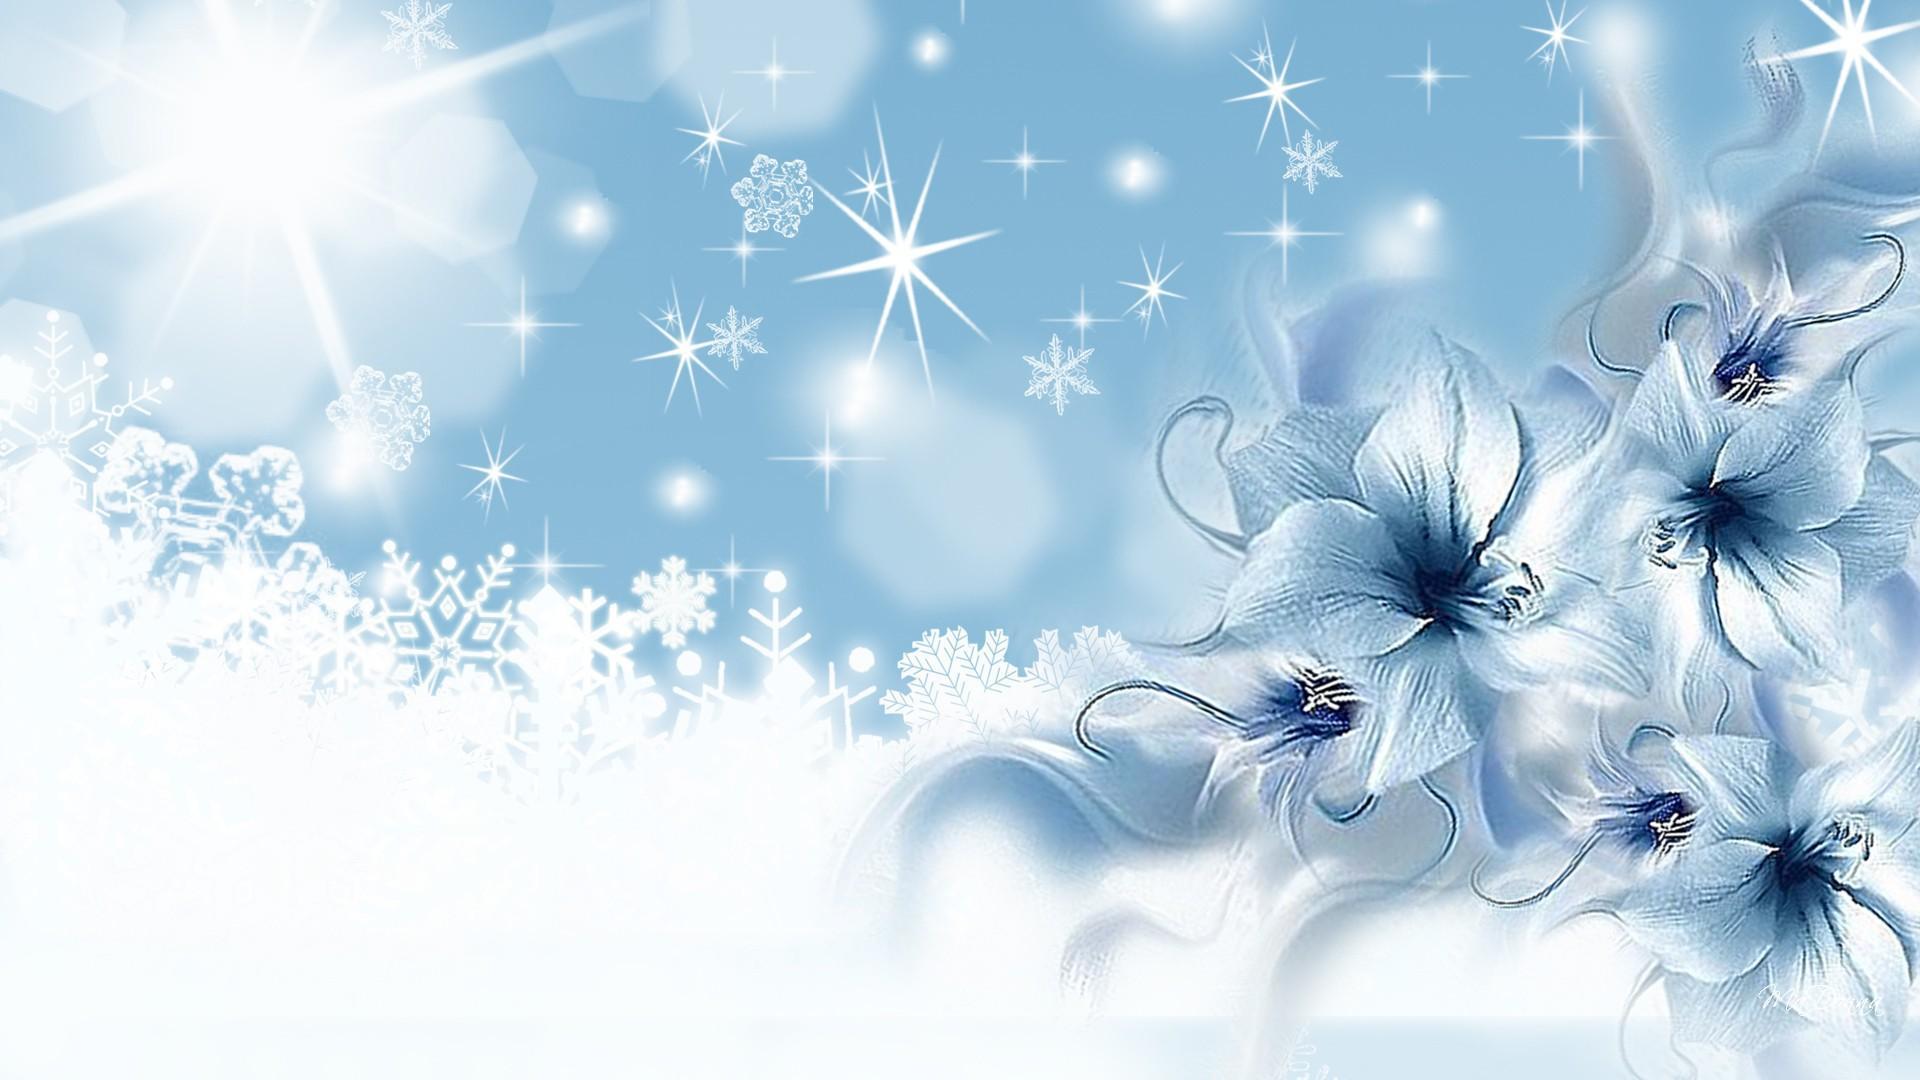 Winter Night Hd Desktop Wallpaper High Definition